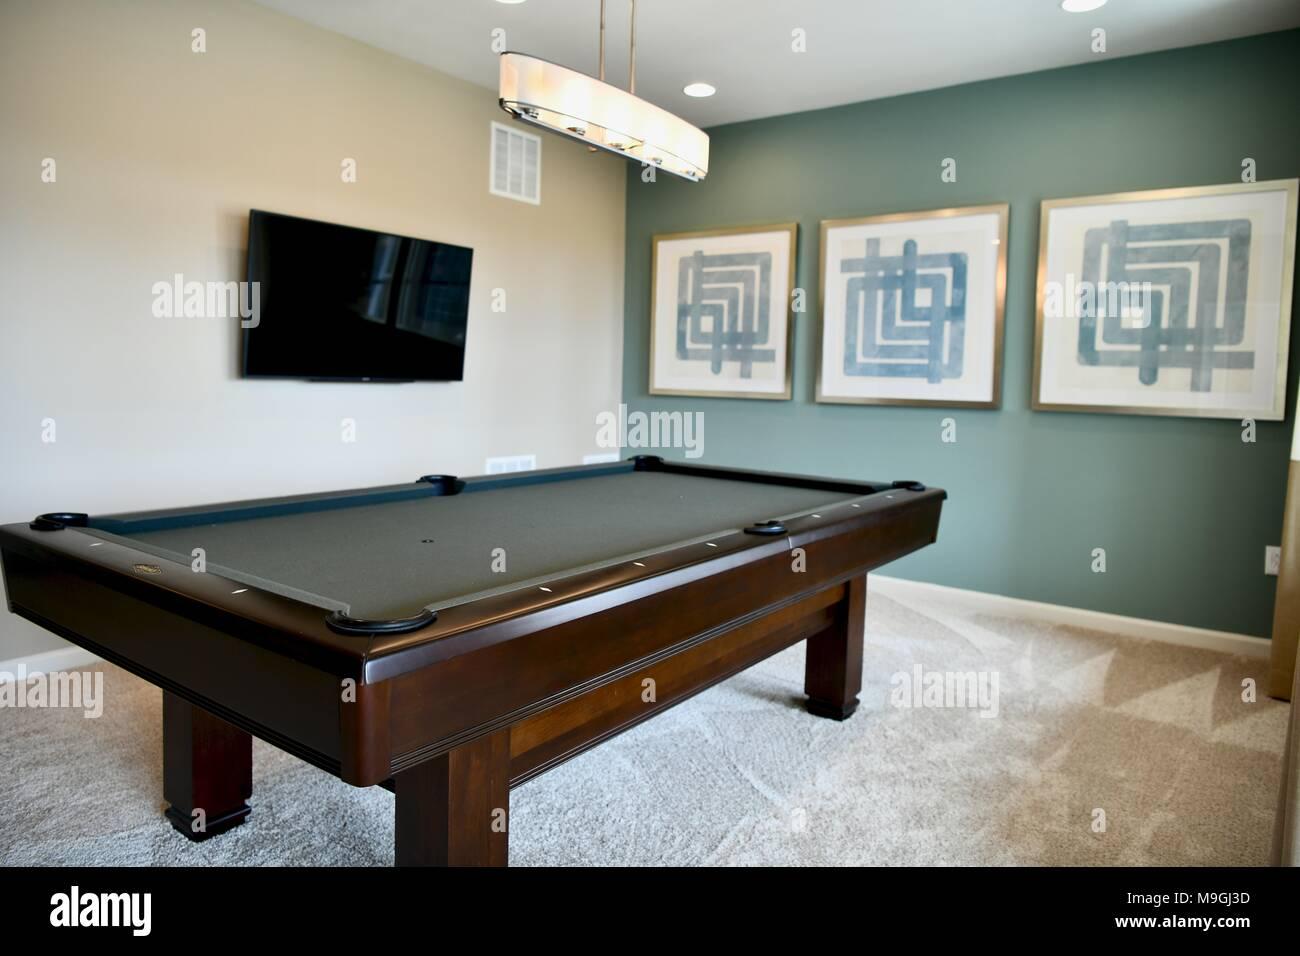 Pool table inside modern home living room Stock Photo: 178001025 - Alamy